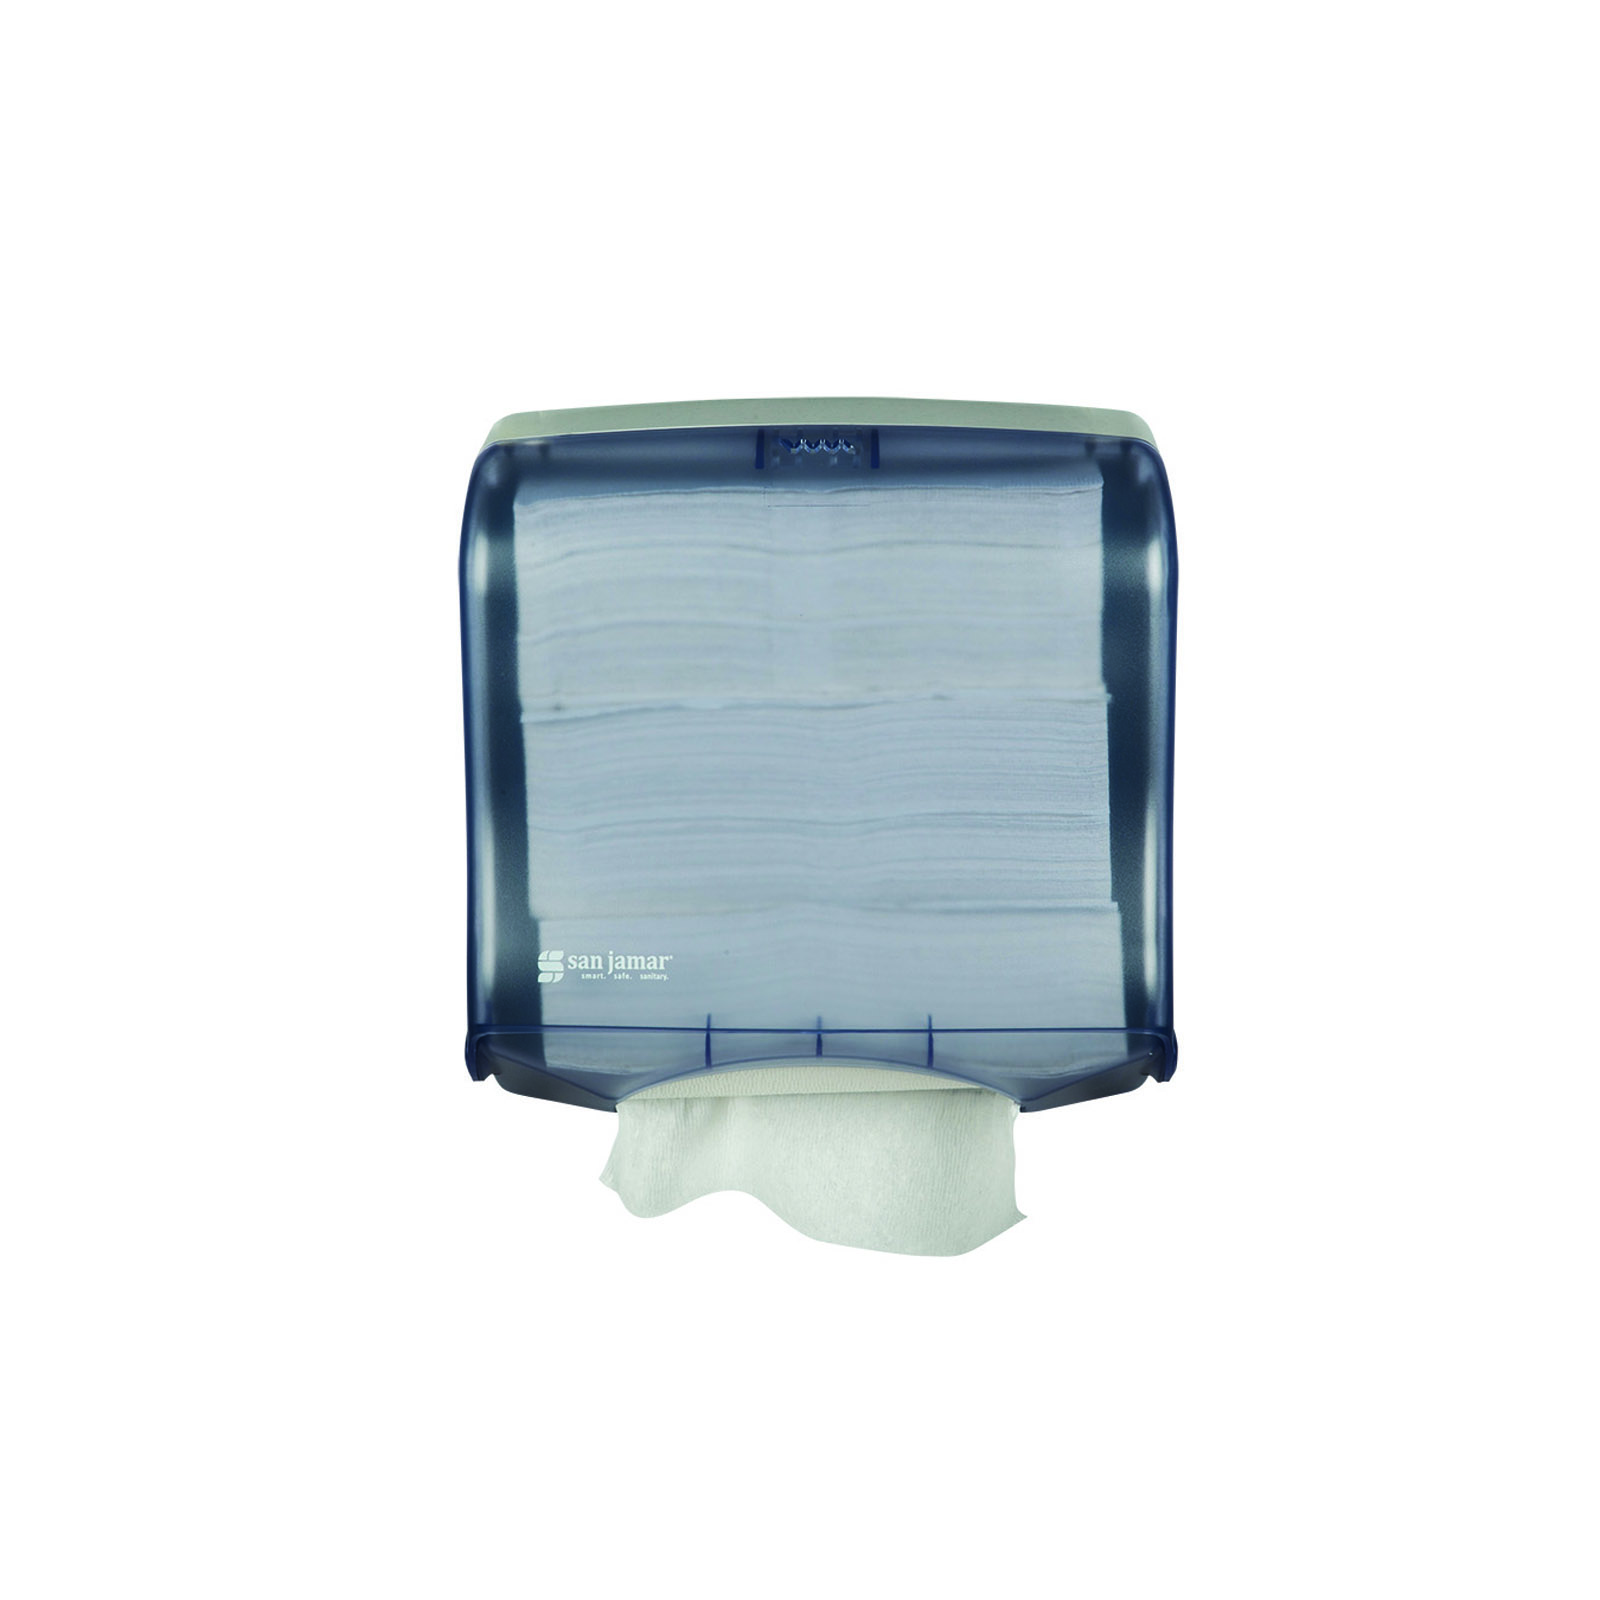 San Jamar T1755TBL paper towel dispenser